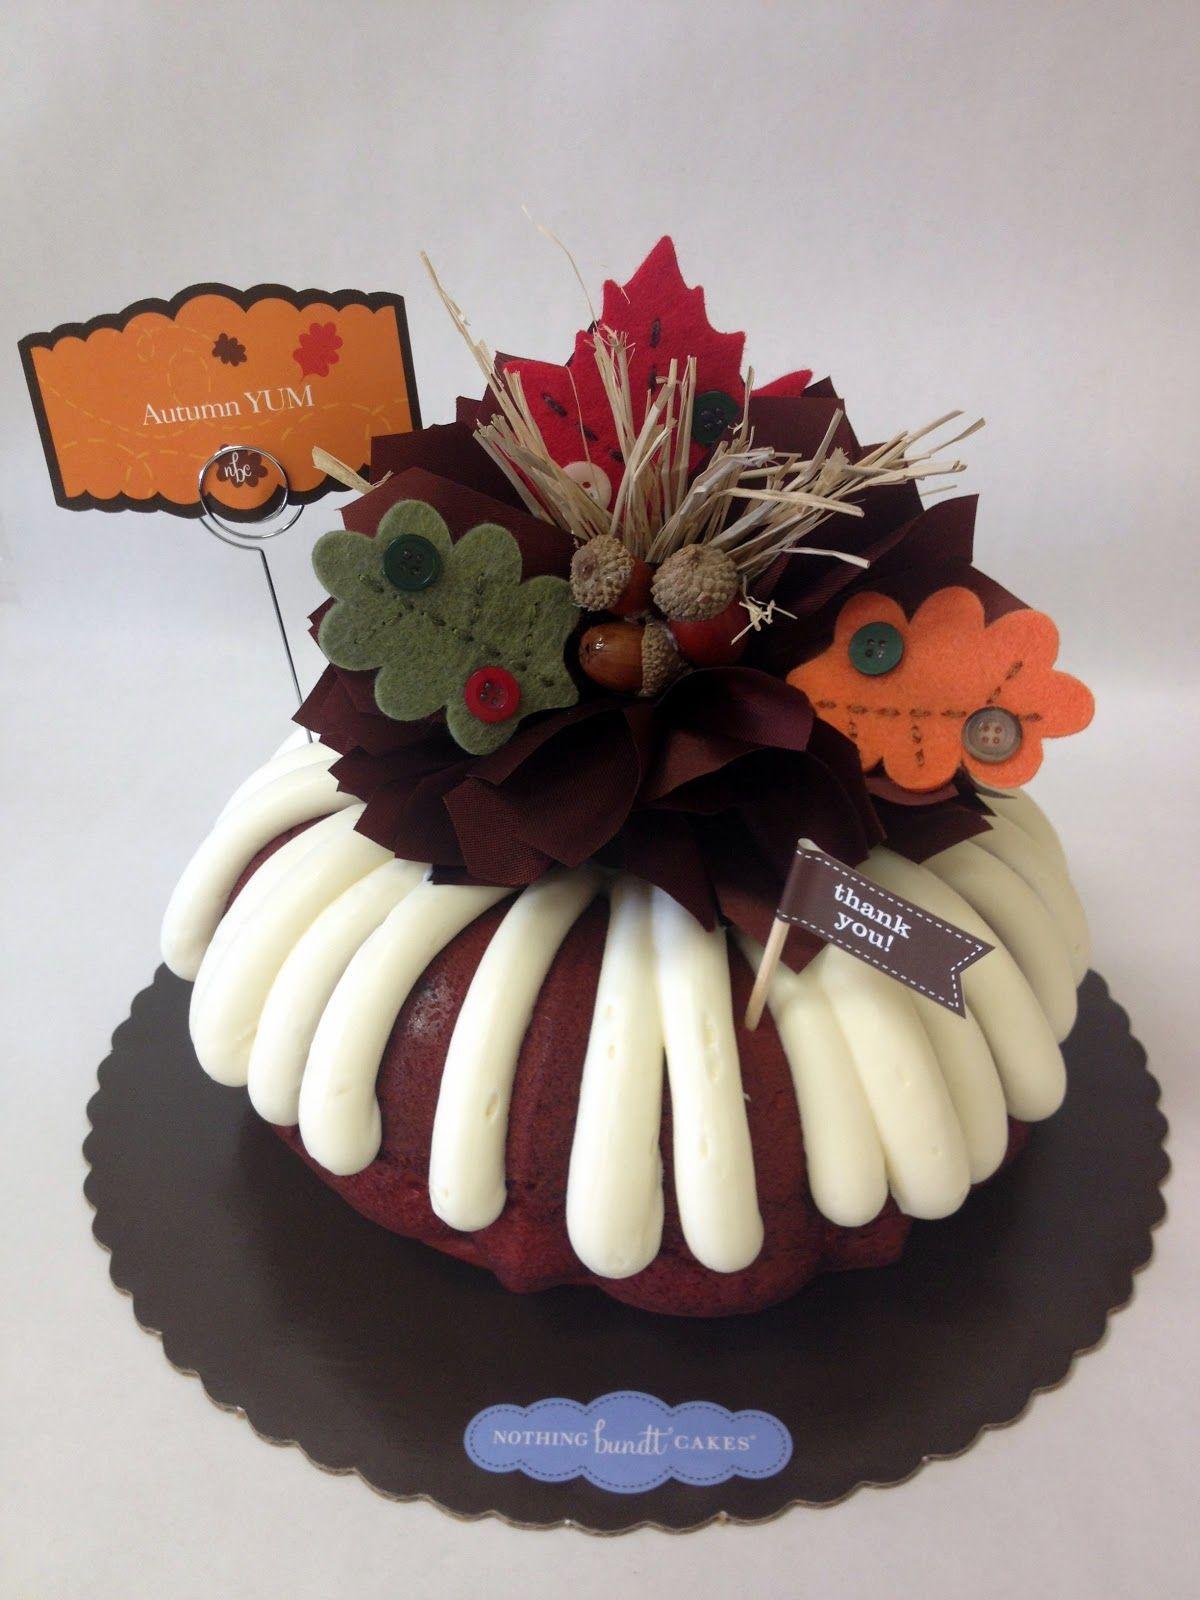 Free nothing bundt cakes bundtlet at the biltmore location